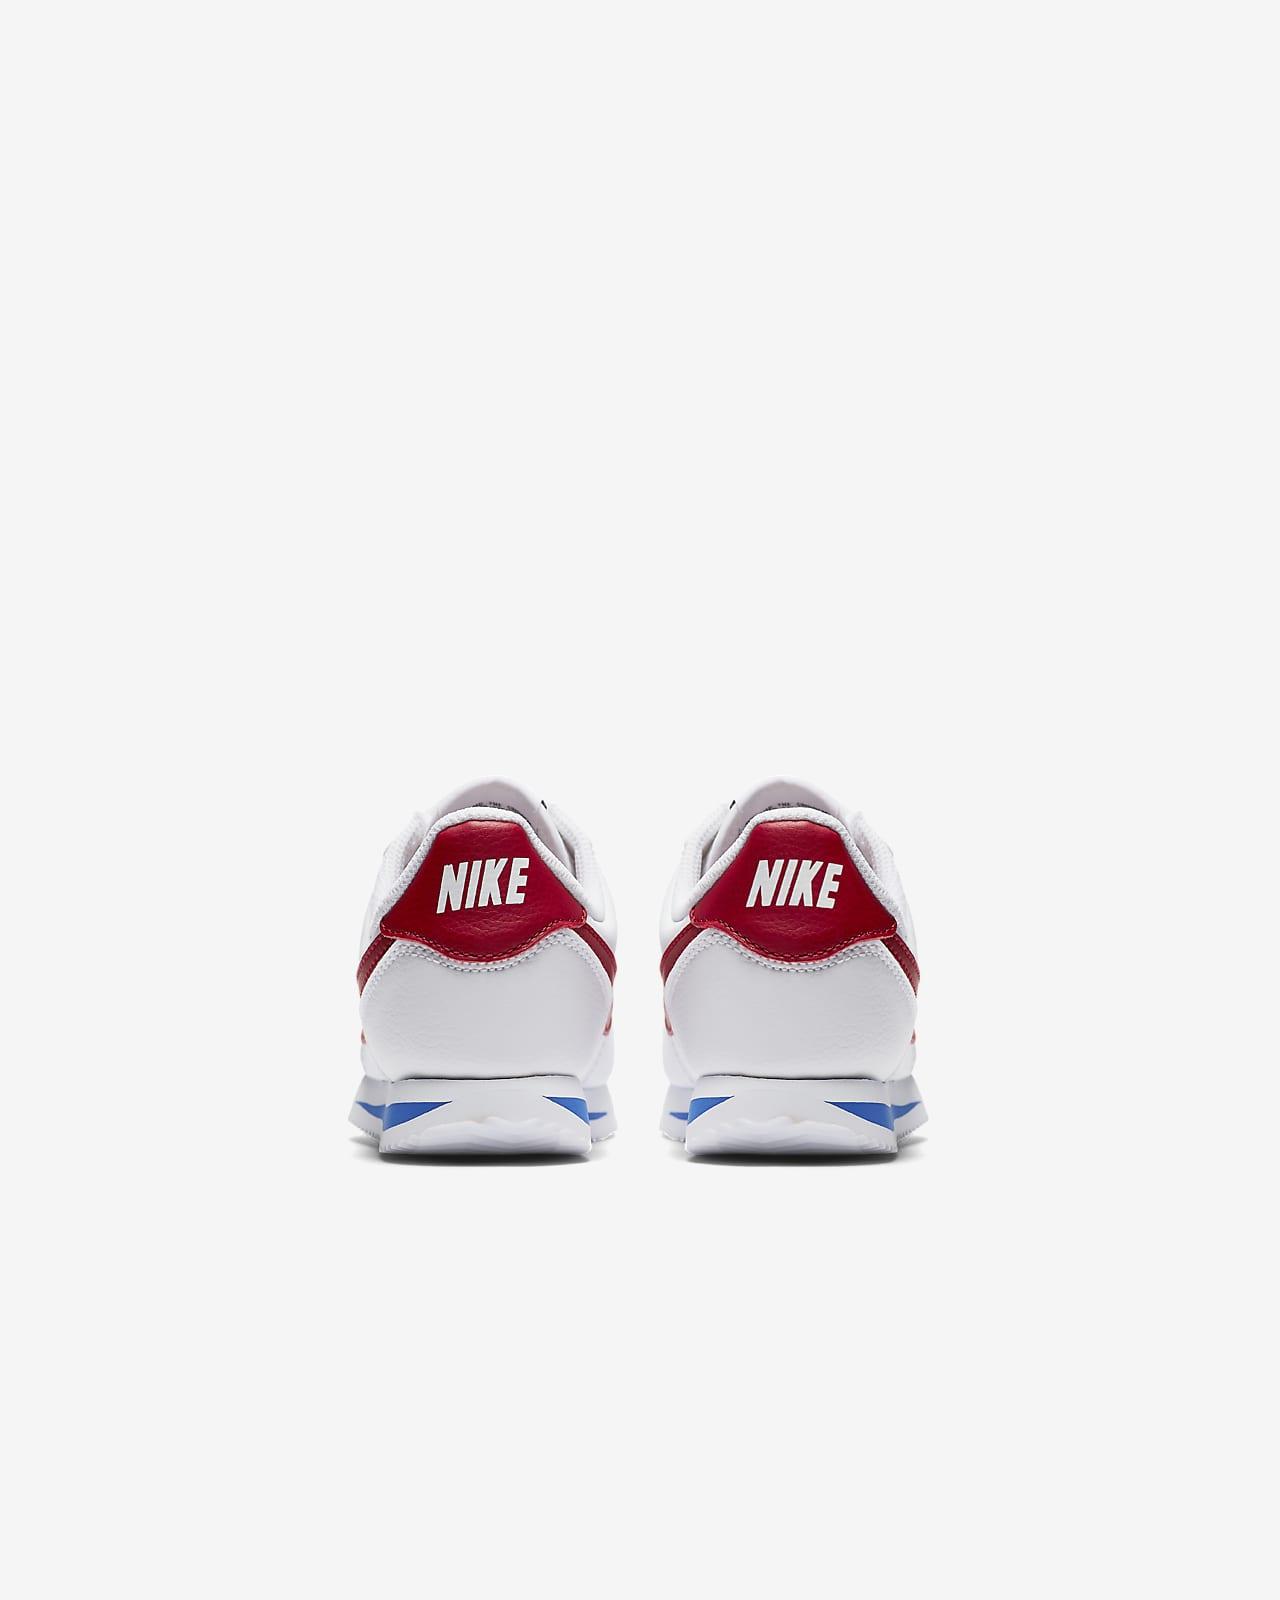 fuga Descendencia Otoño  Nike Cortez Basic SL Little Kids' Shoe. Nike.com